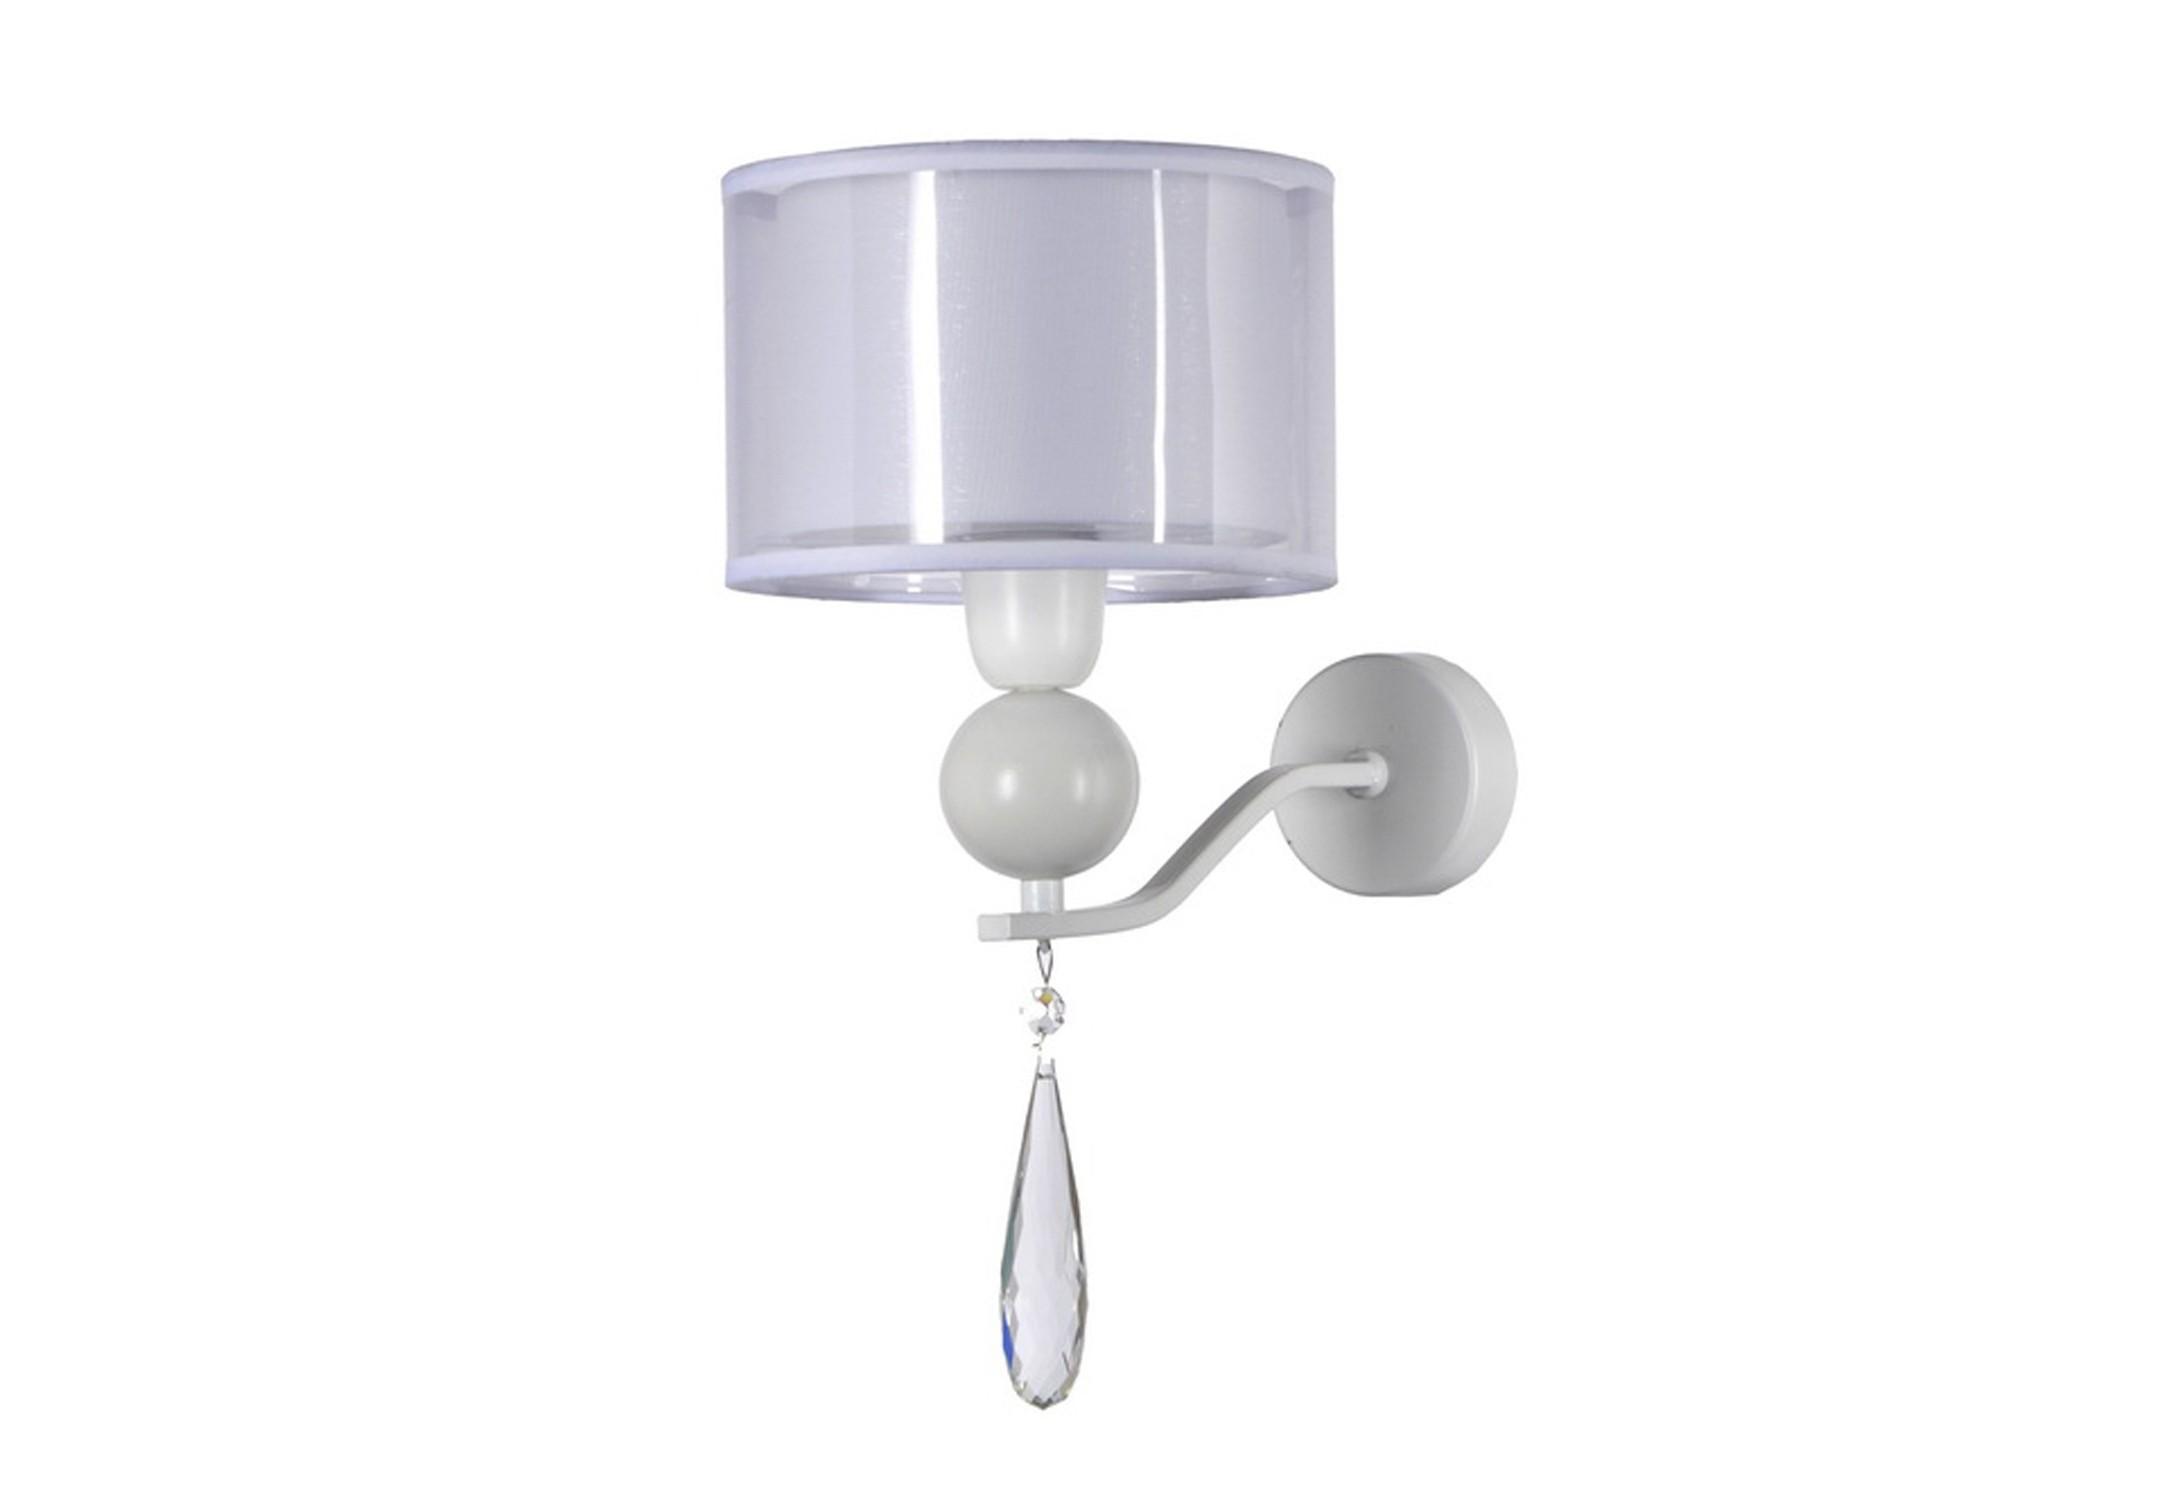 БраБра<br>Вид цоколя: E14Мощность:&amp;nbsp; 40WКоличество ламп: 1 (нет в комплекте)<br><br>kit: None<br>gender: None